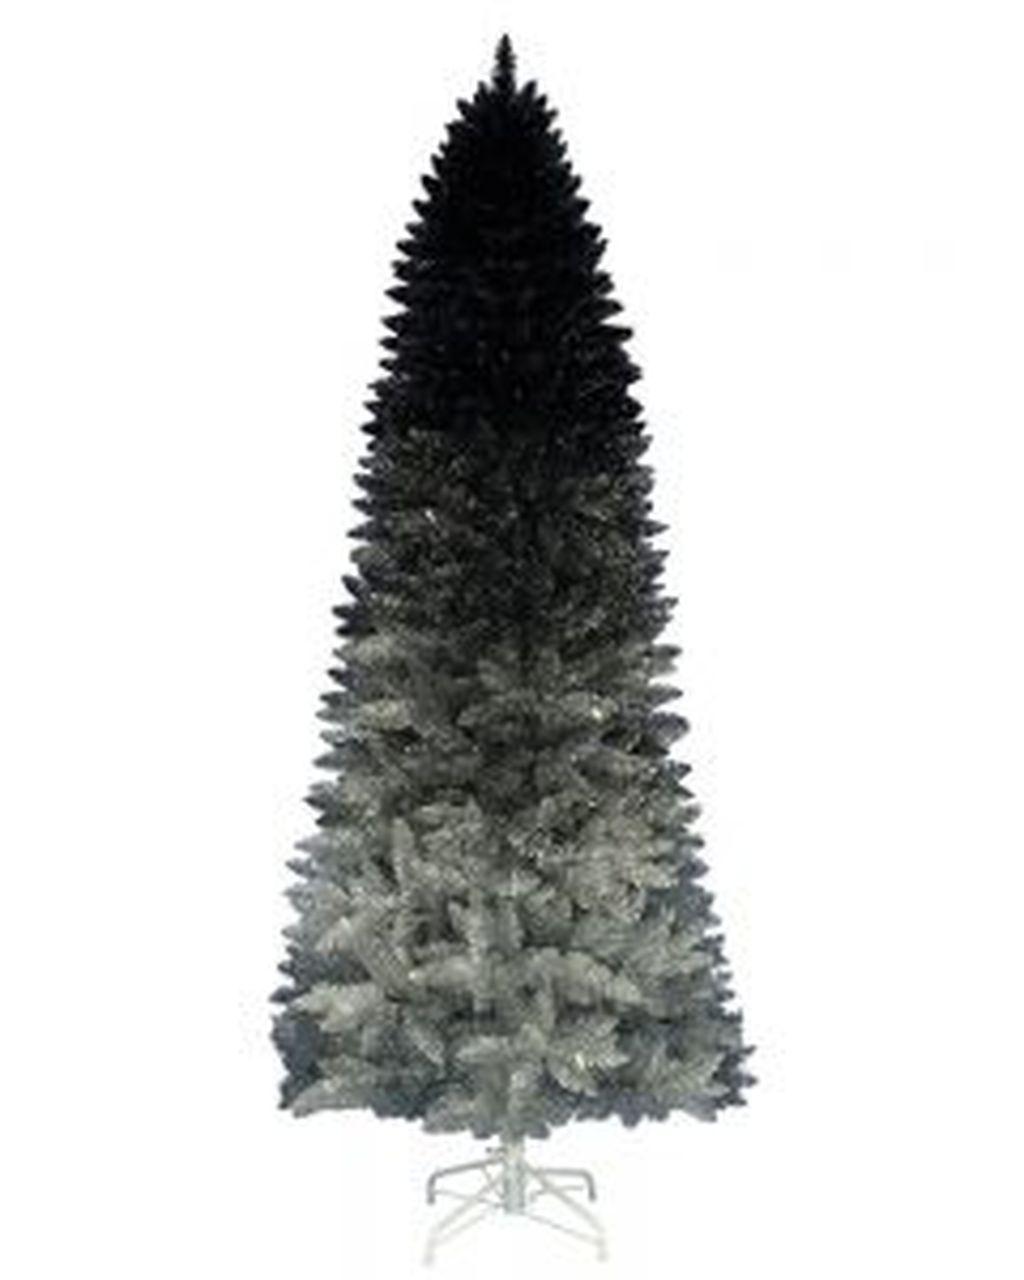 Unique And Unusual Black Christmas Tree Decoration Ideas 19